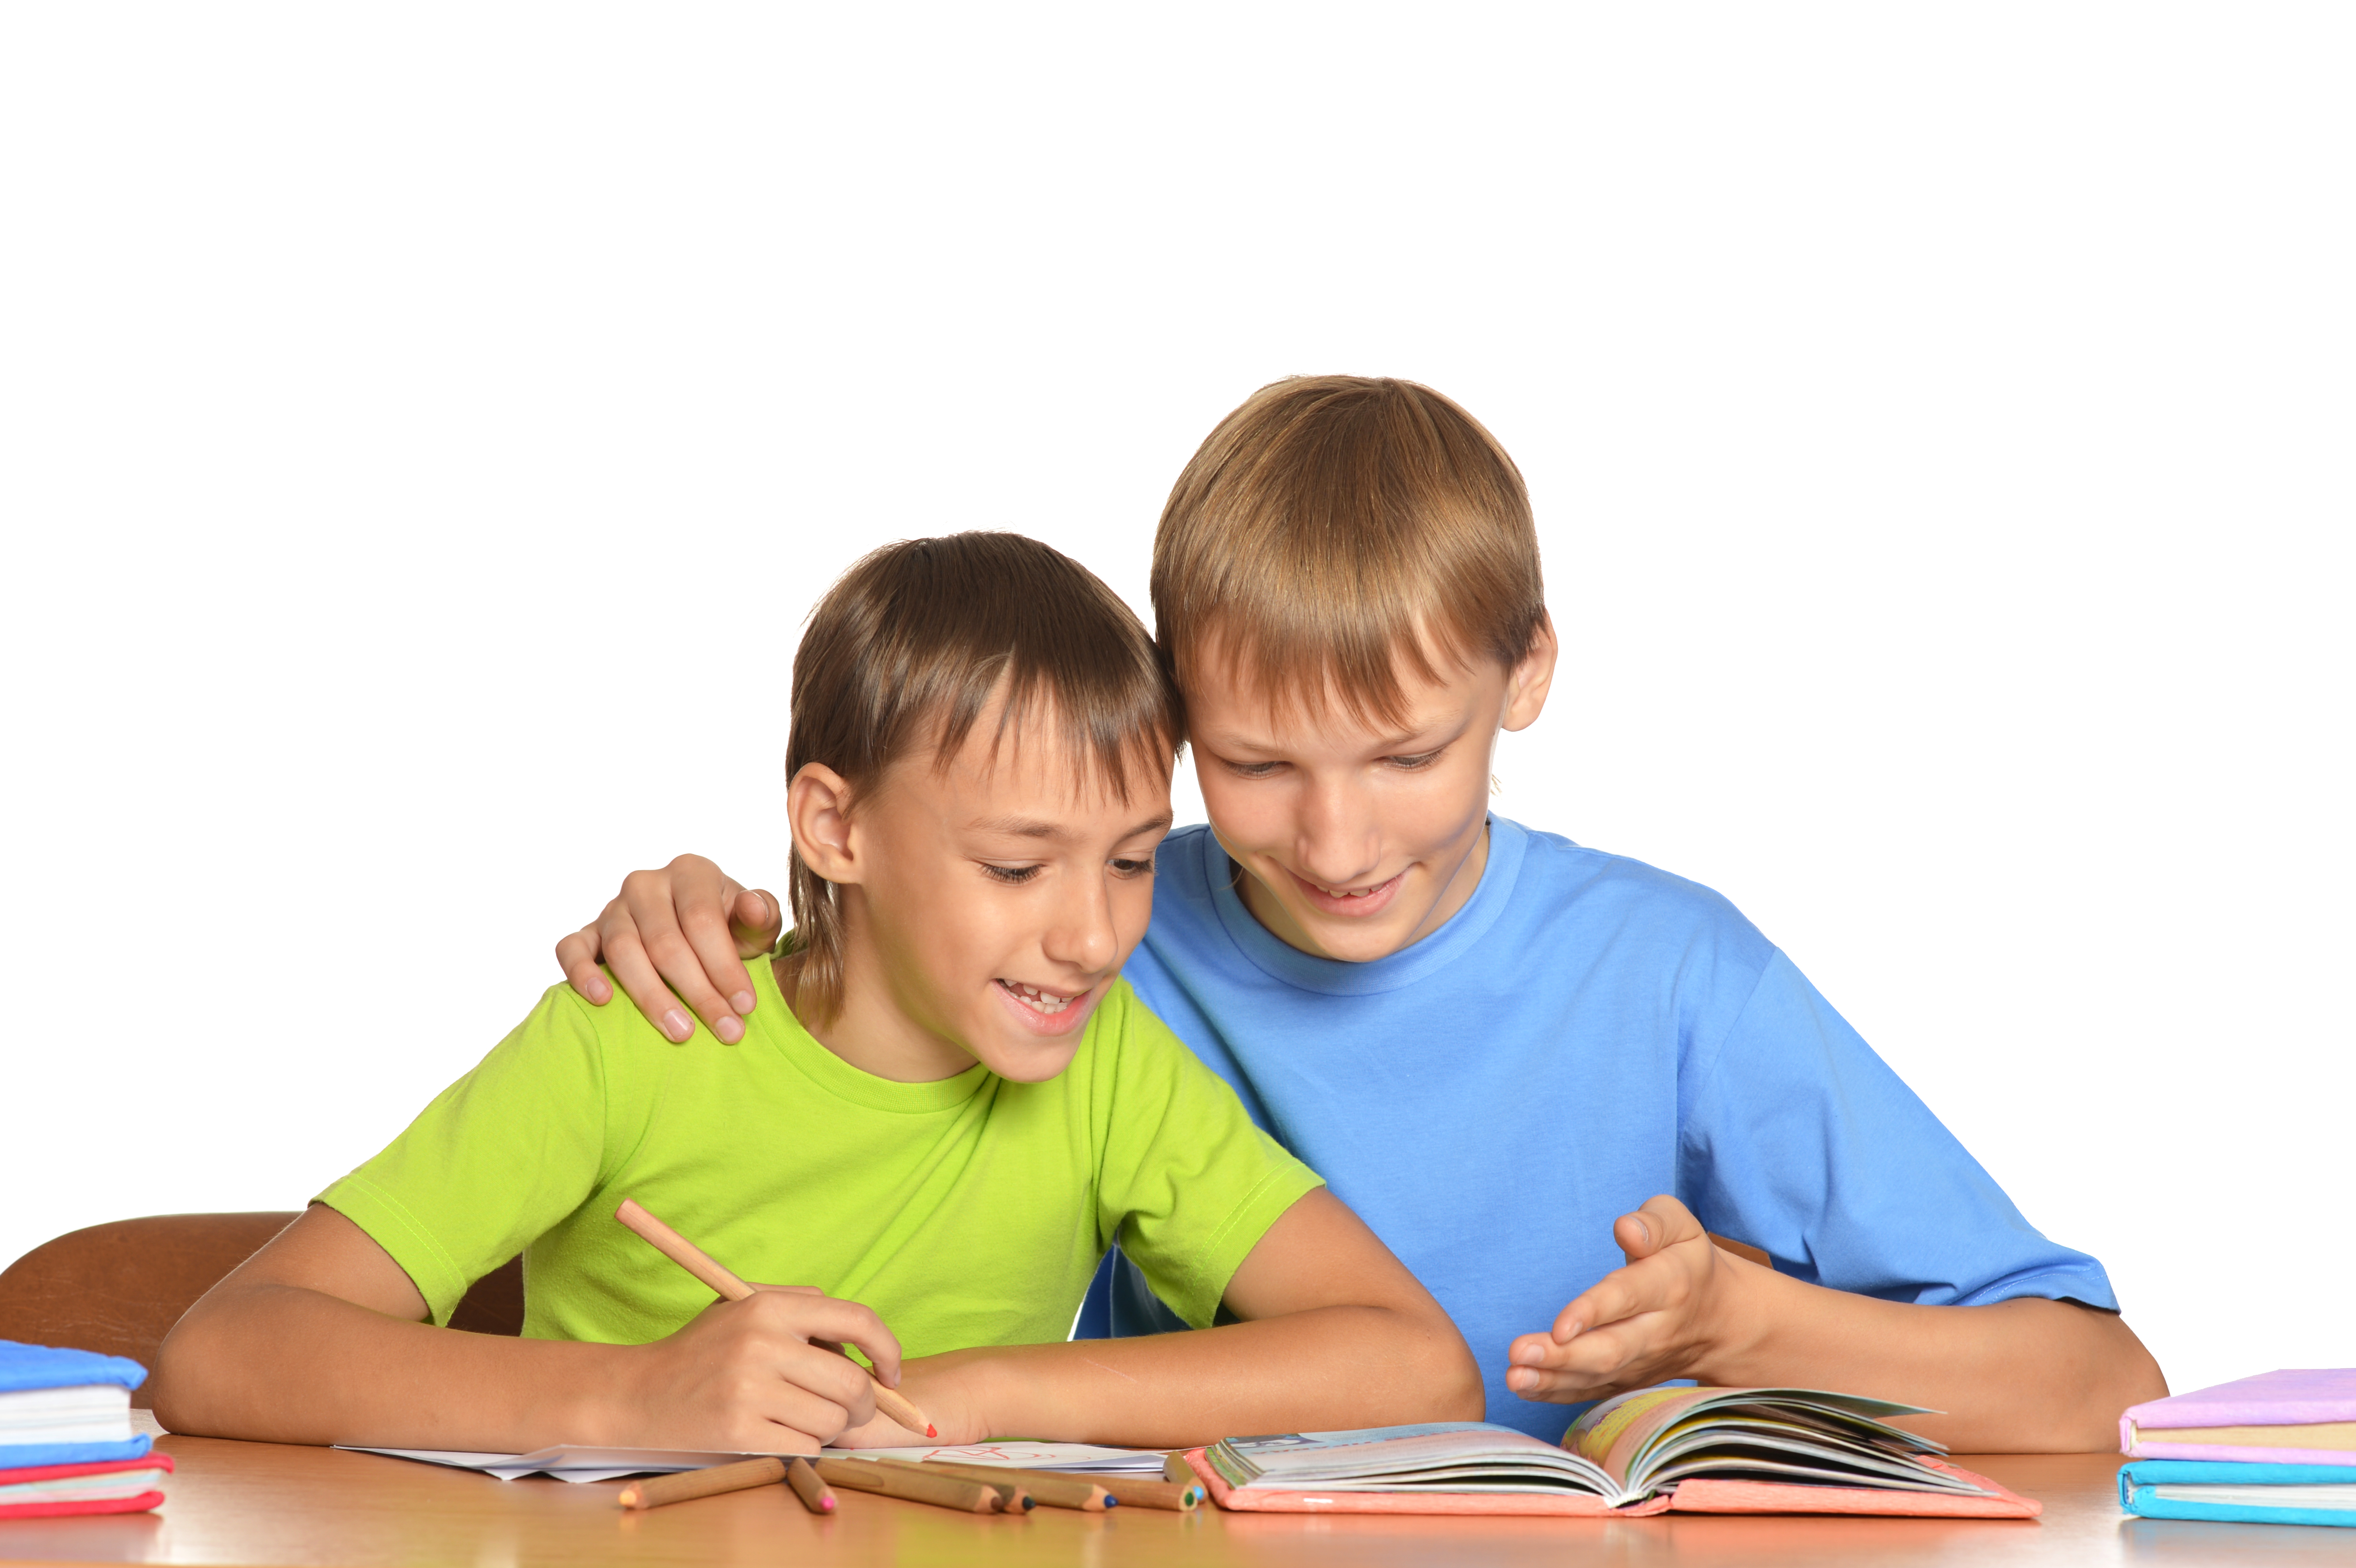 A List of Adventurous Books for Tween Boys